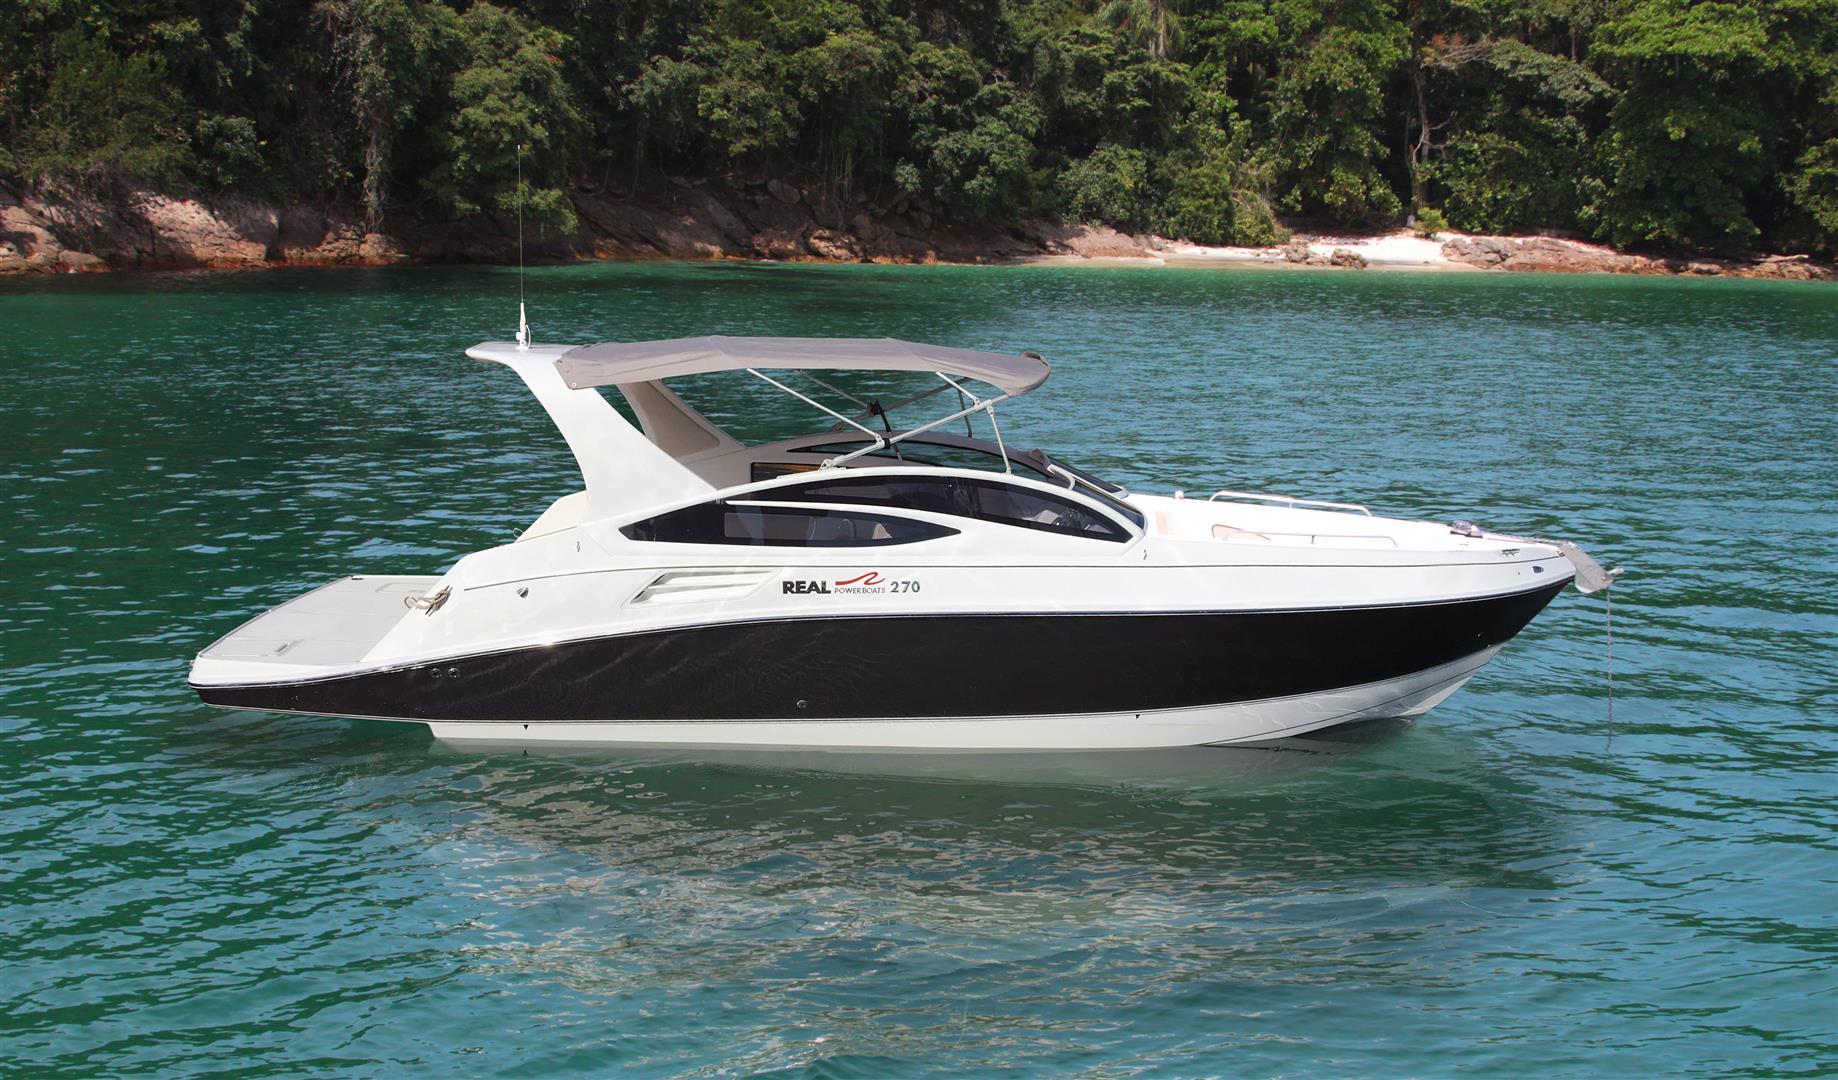 Real Powerboats REAL 270